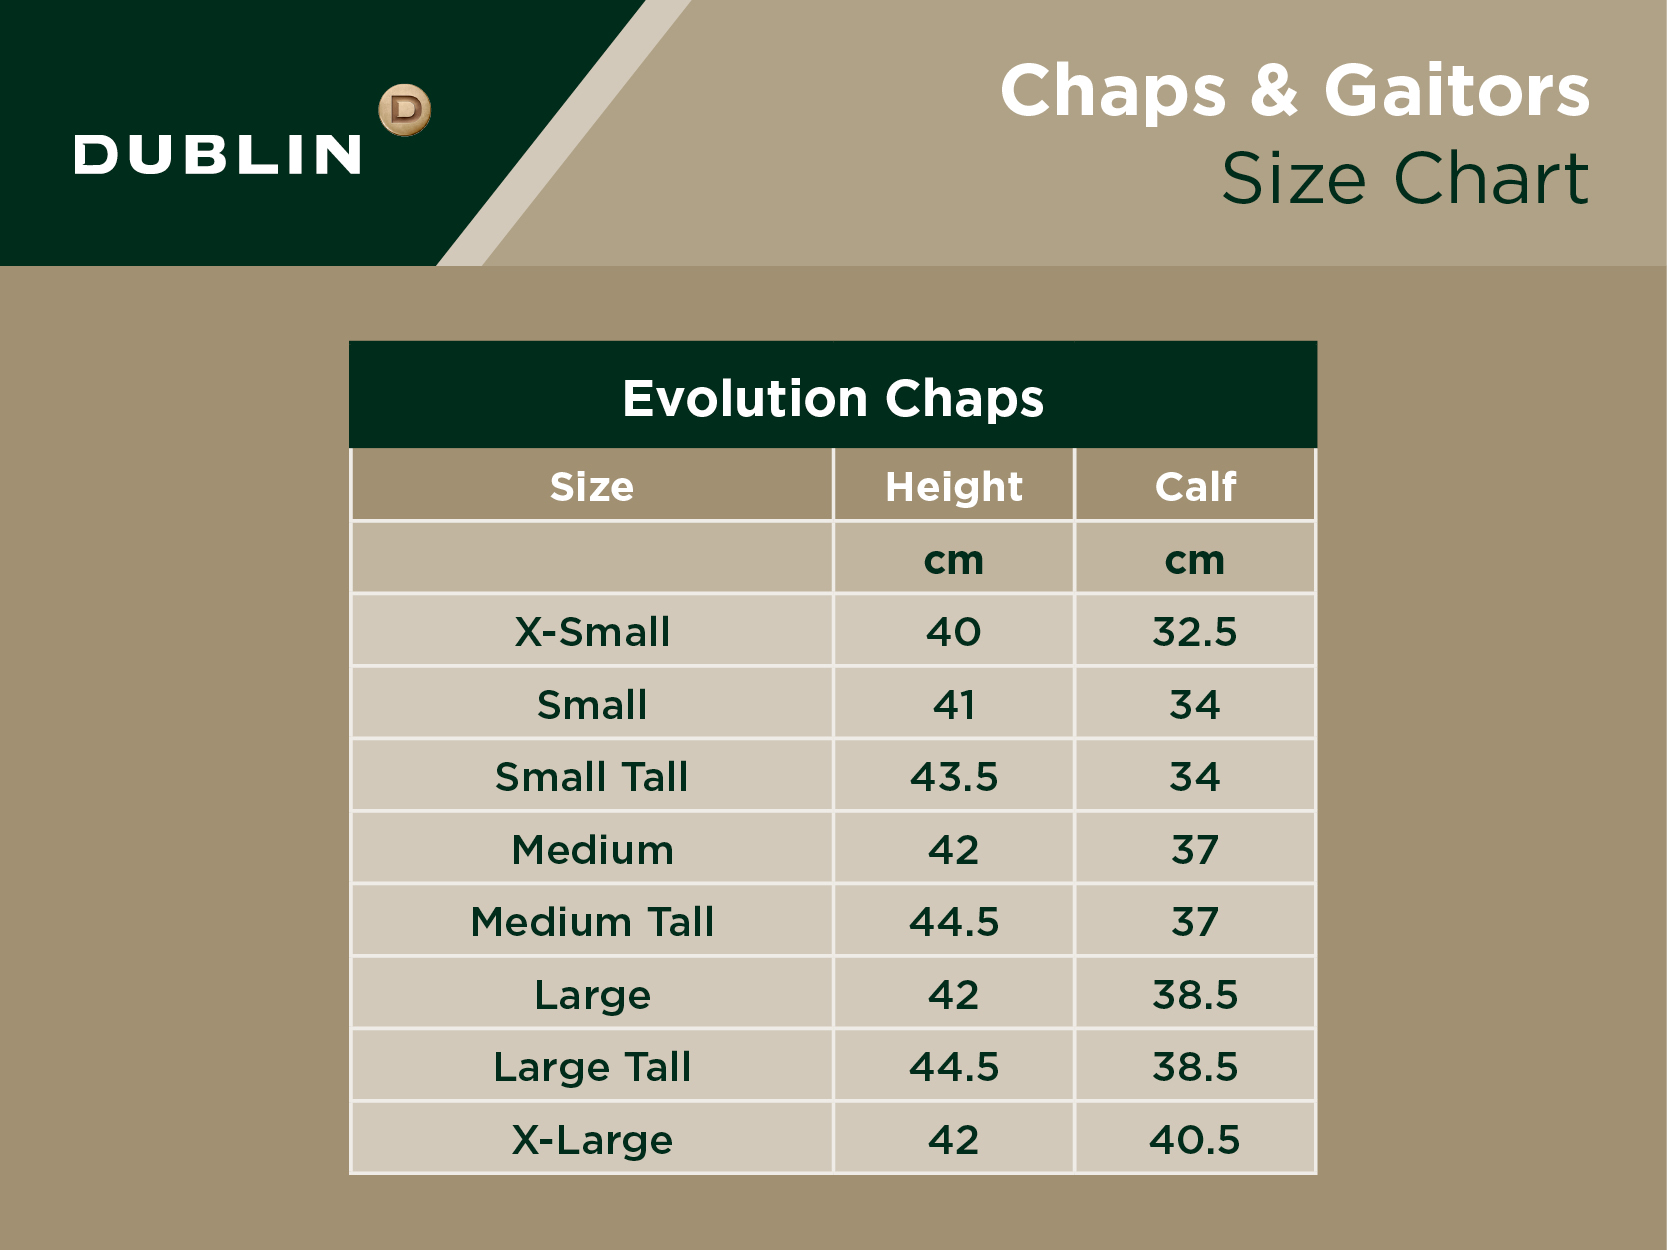 Evolution Chaps Size Chart